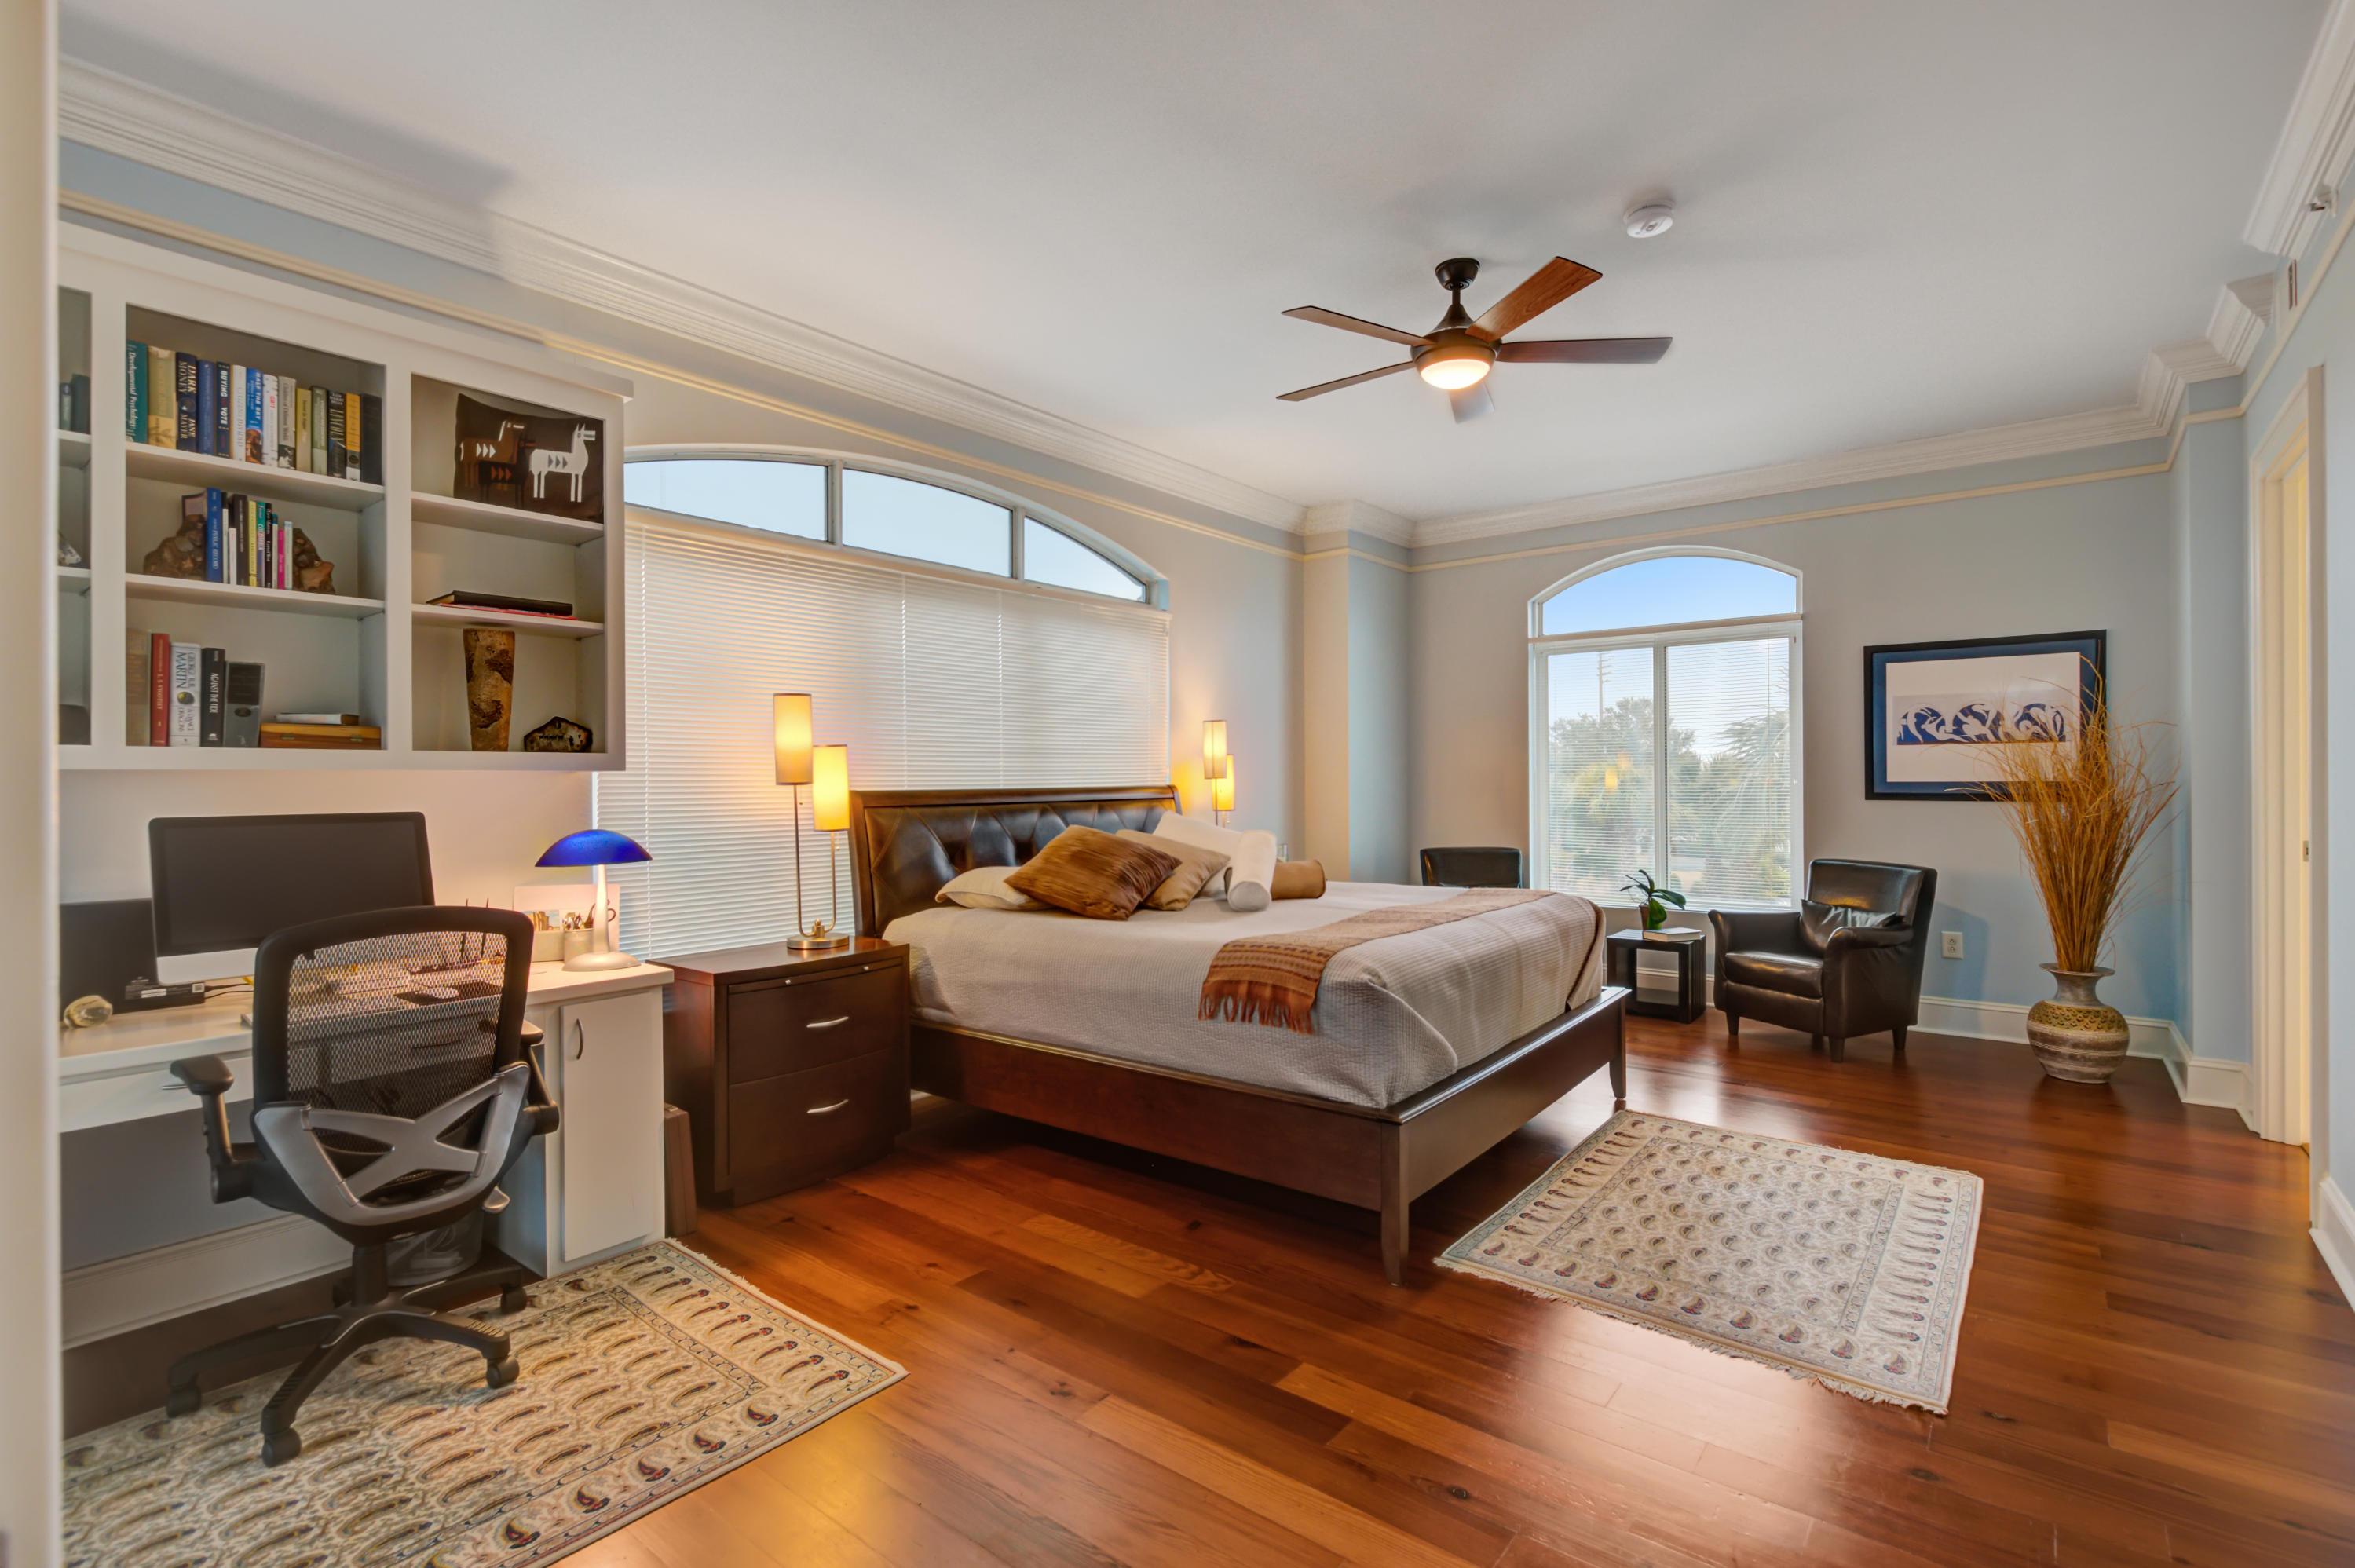 Renaissance On Chas Harbor Homes For Sale - 231 Plaza, Mount Pleasant, SC - 18